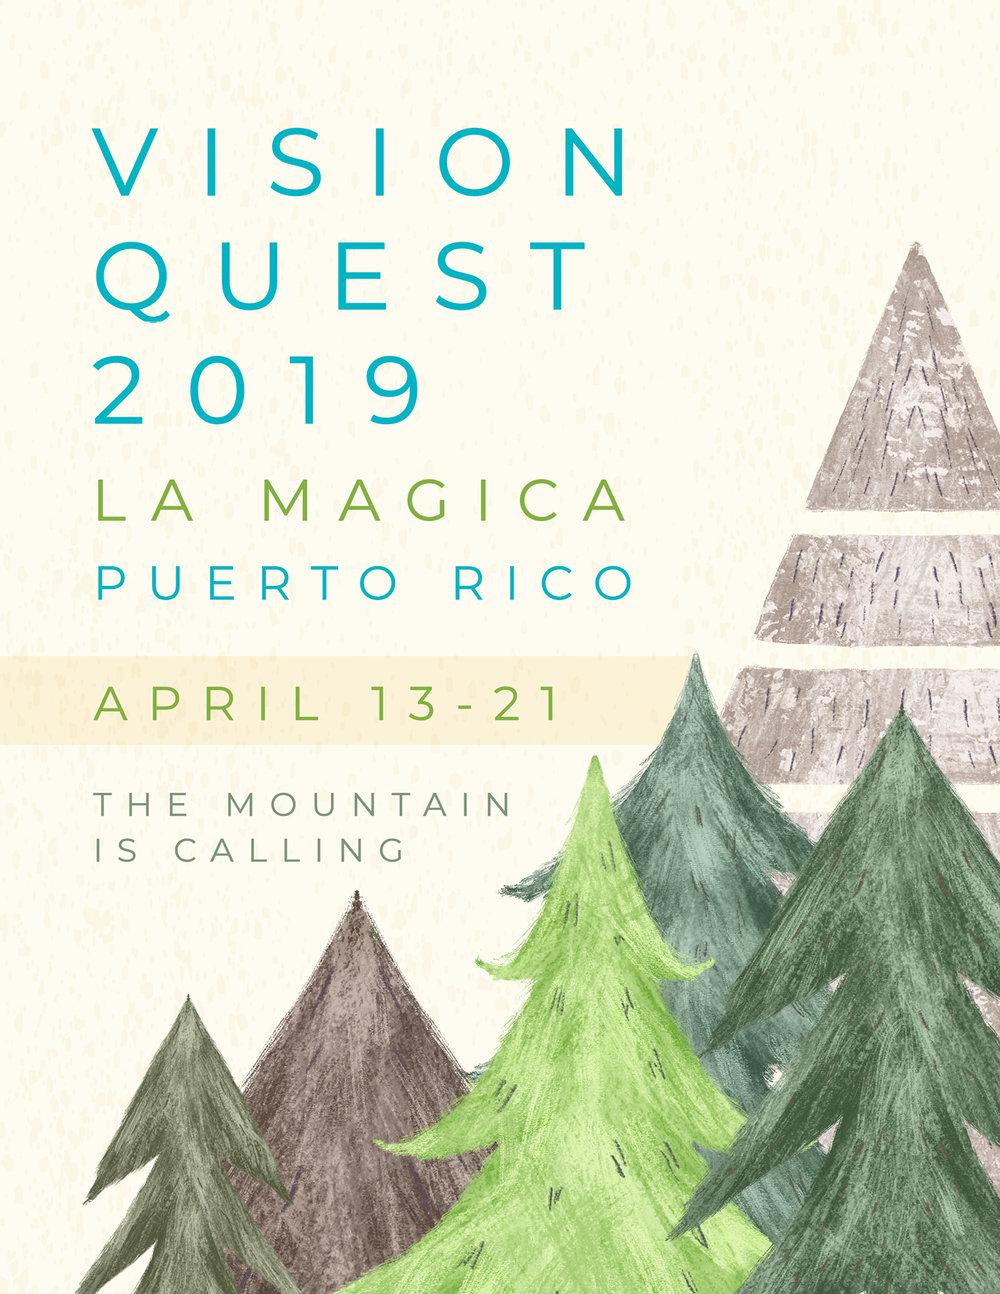 VISION QUEST_PuertoRico_20191.jpg